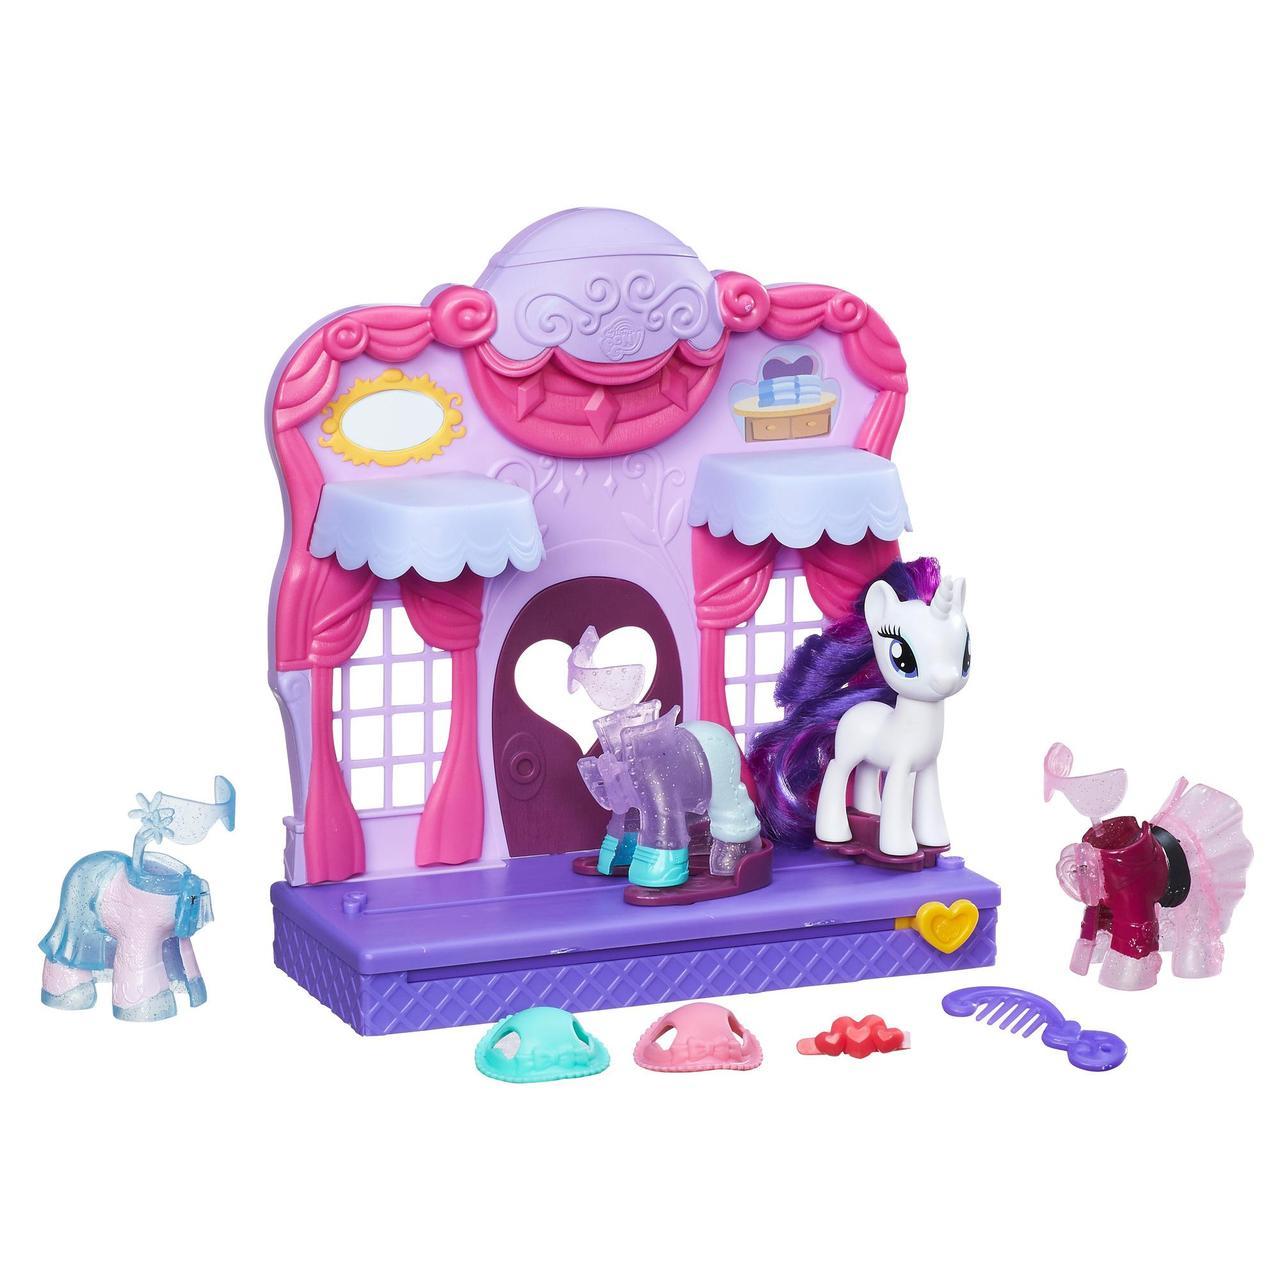 Май Литл Пони Бутик Рарити в Кантерлоте My Little Pony Friendship is Magic Rarity Fashion Runway